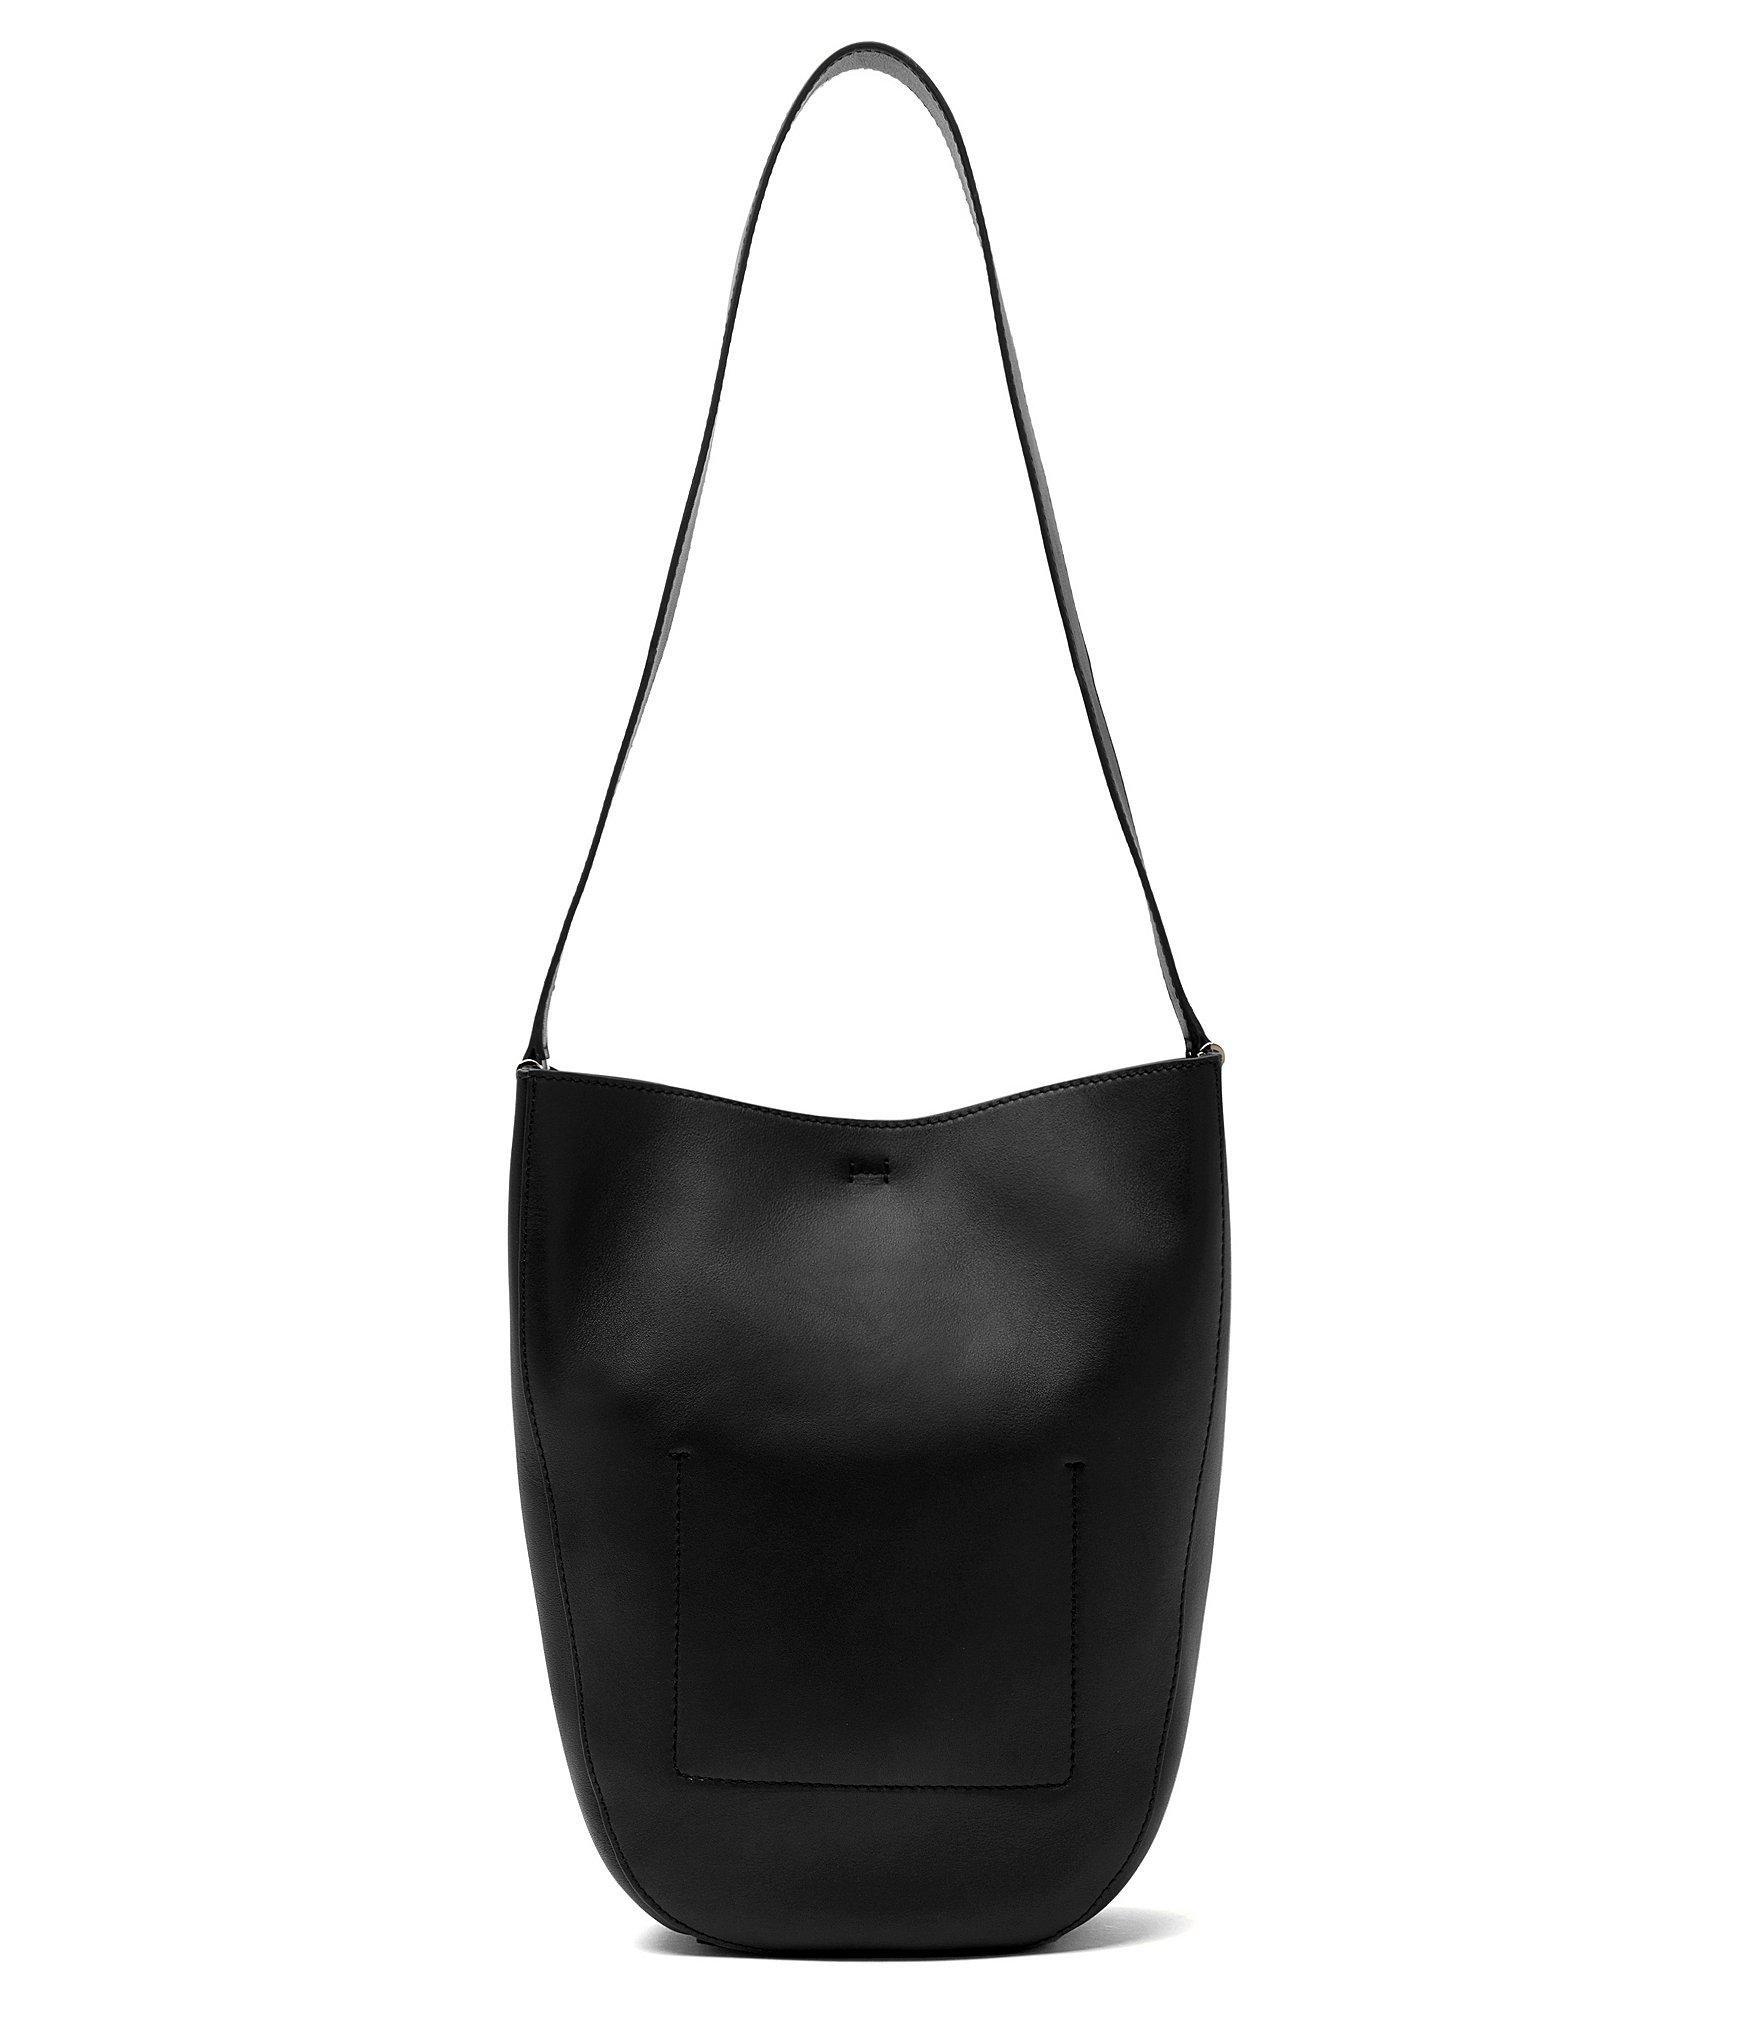 Etienne aigner black leather gloves - Etienne Aigner